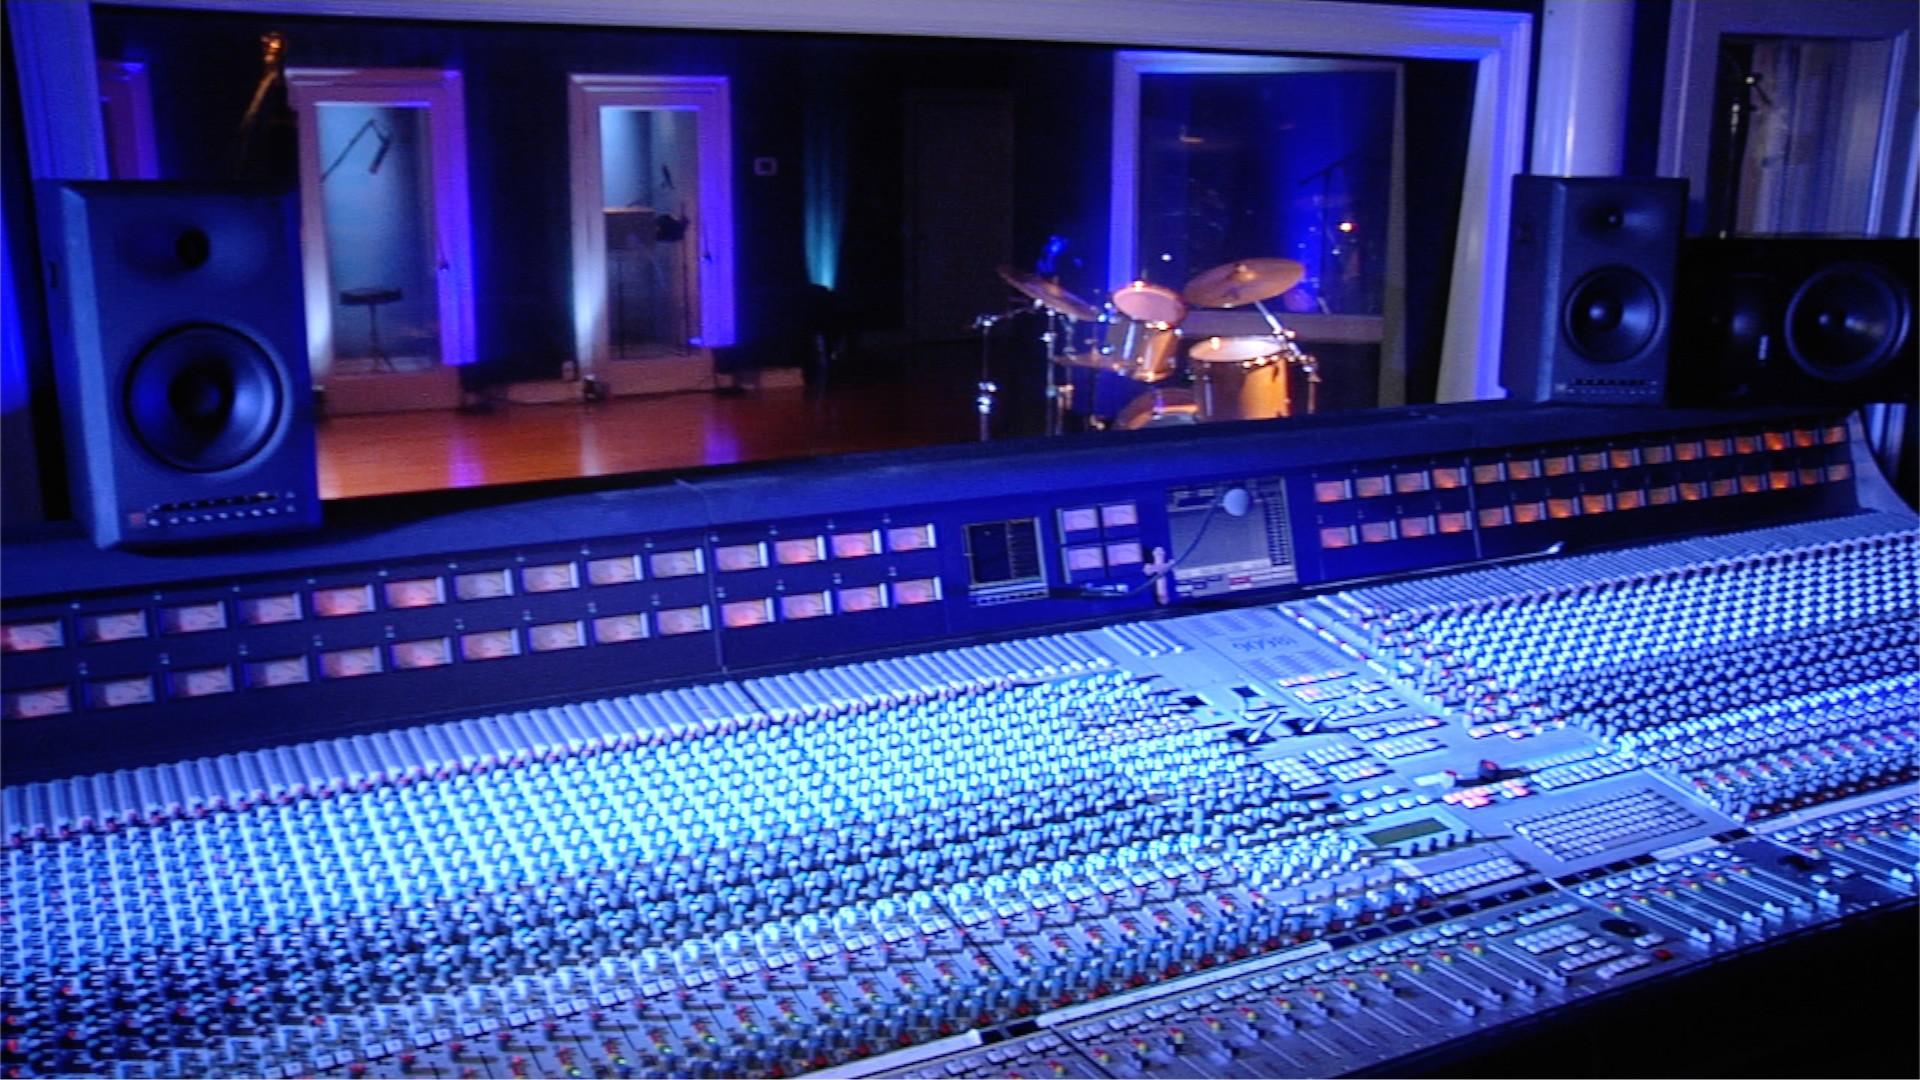 1920x1080 Wallpaper Futuristic Girl Music Recording Studio Hd Wallpaper 74 Images